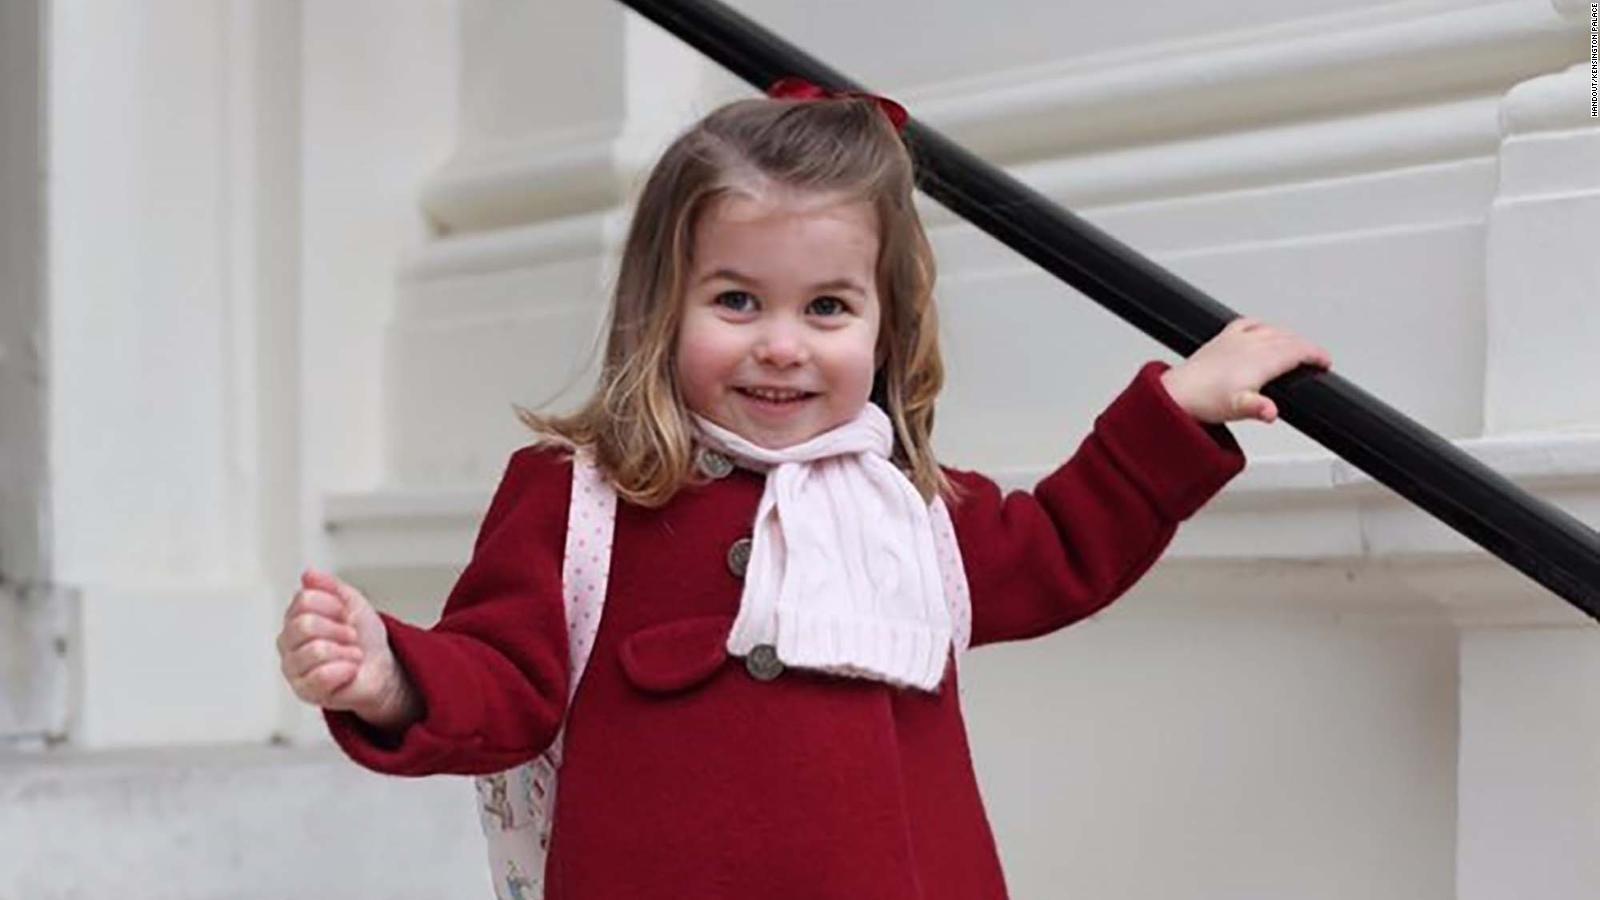 180108161026 01 princess charlotte starts nursery school 0108 full 169.jpg?resize=636,358 - 8 regras que a princesa Charlotte já é obrigada a seguir